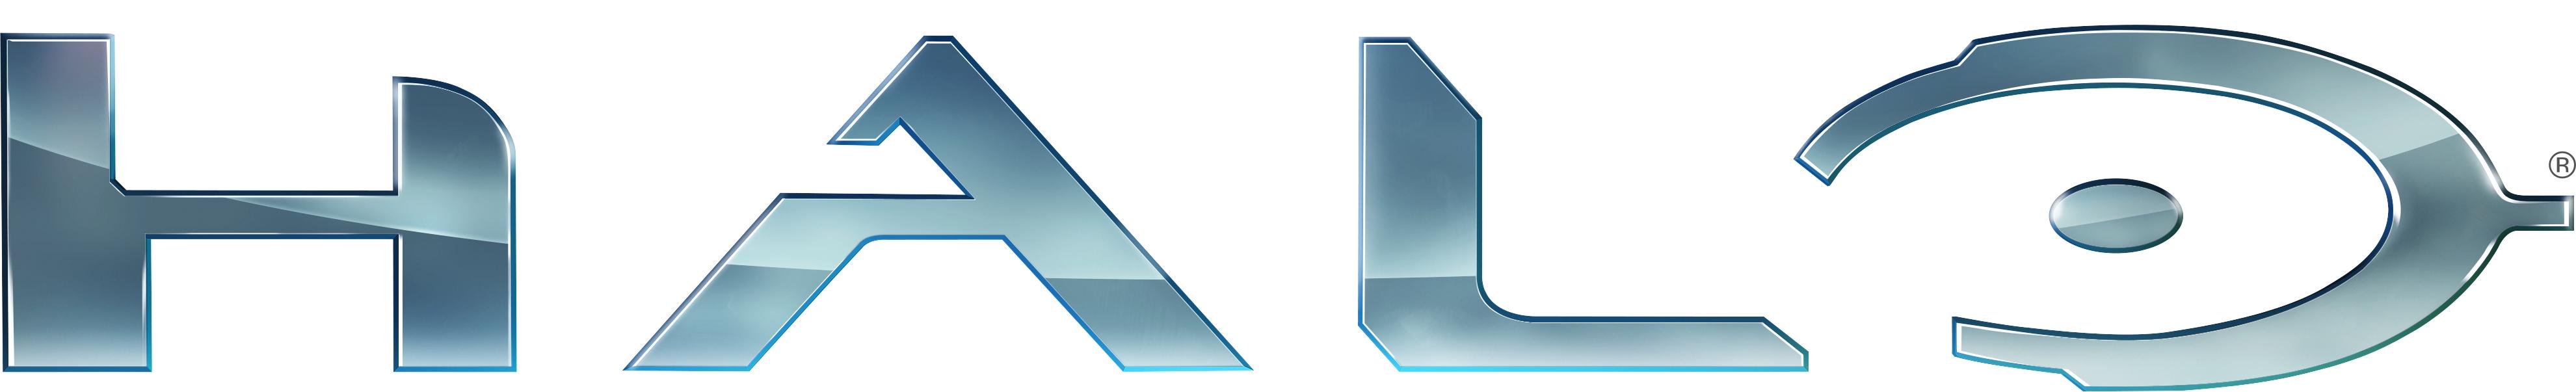 Halo - Audiobook Collection 2015 - Eric Nylund, Joseph Staten, Greg Bear, Karen Traviss, more.